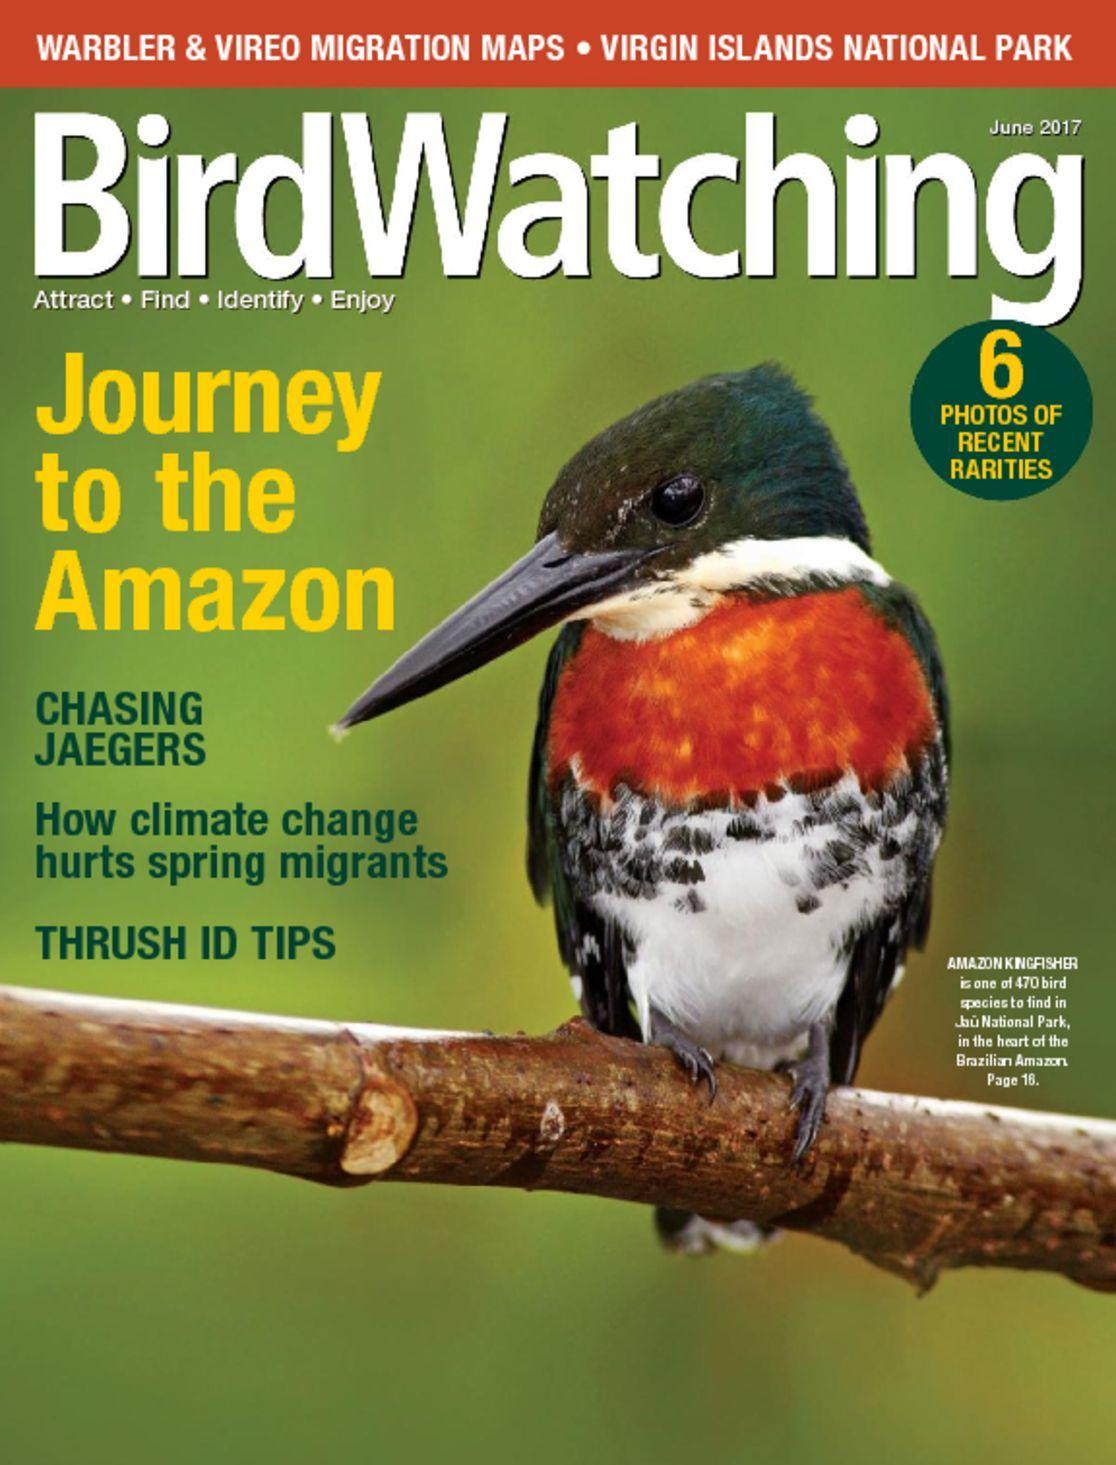 Birdwatching Magazine Subscription